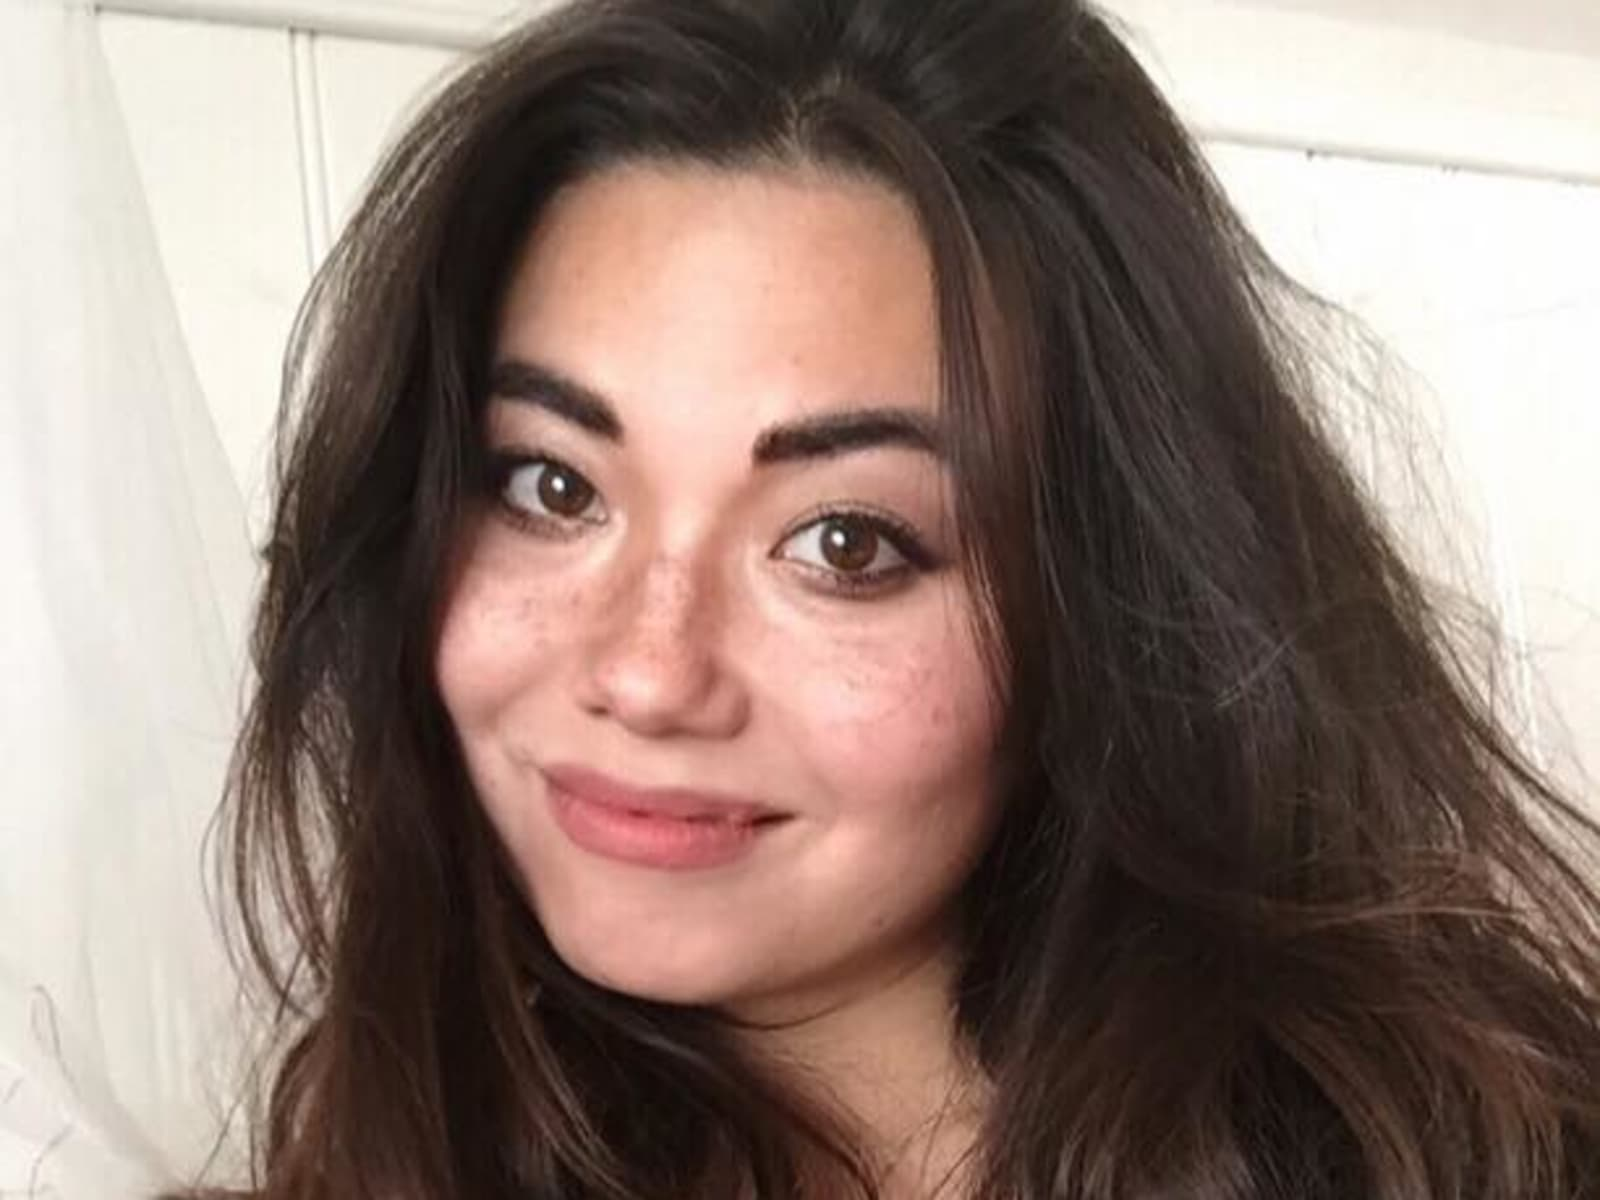 Julia from London, United Kingdom